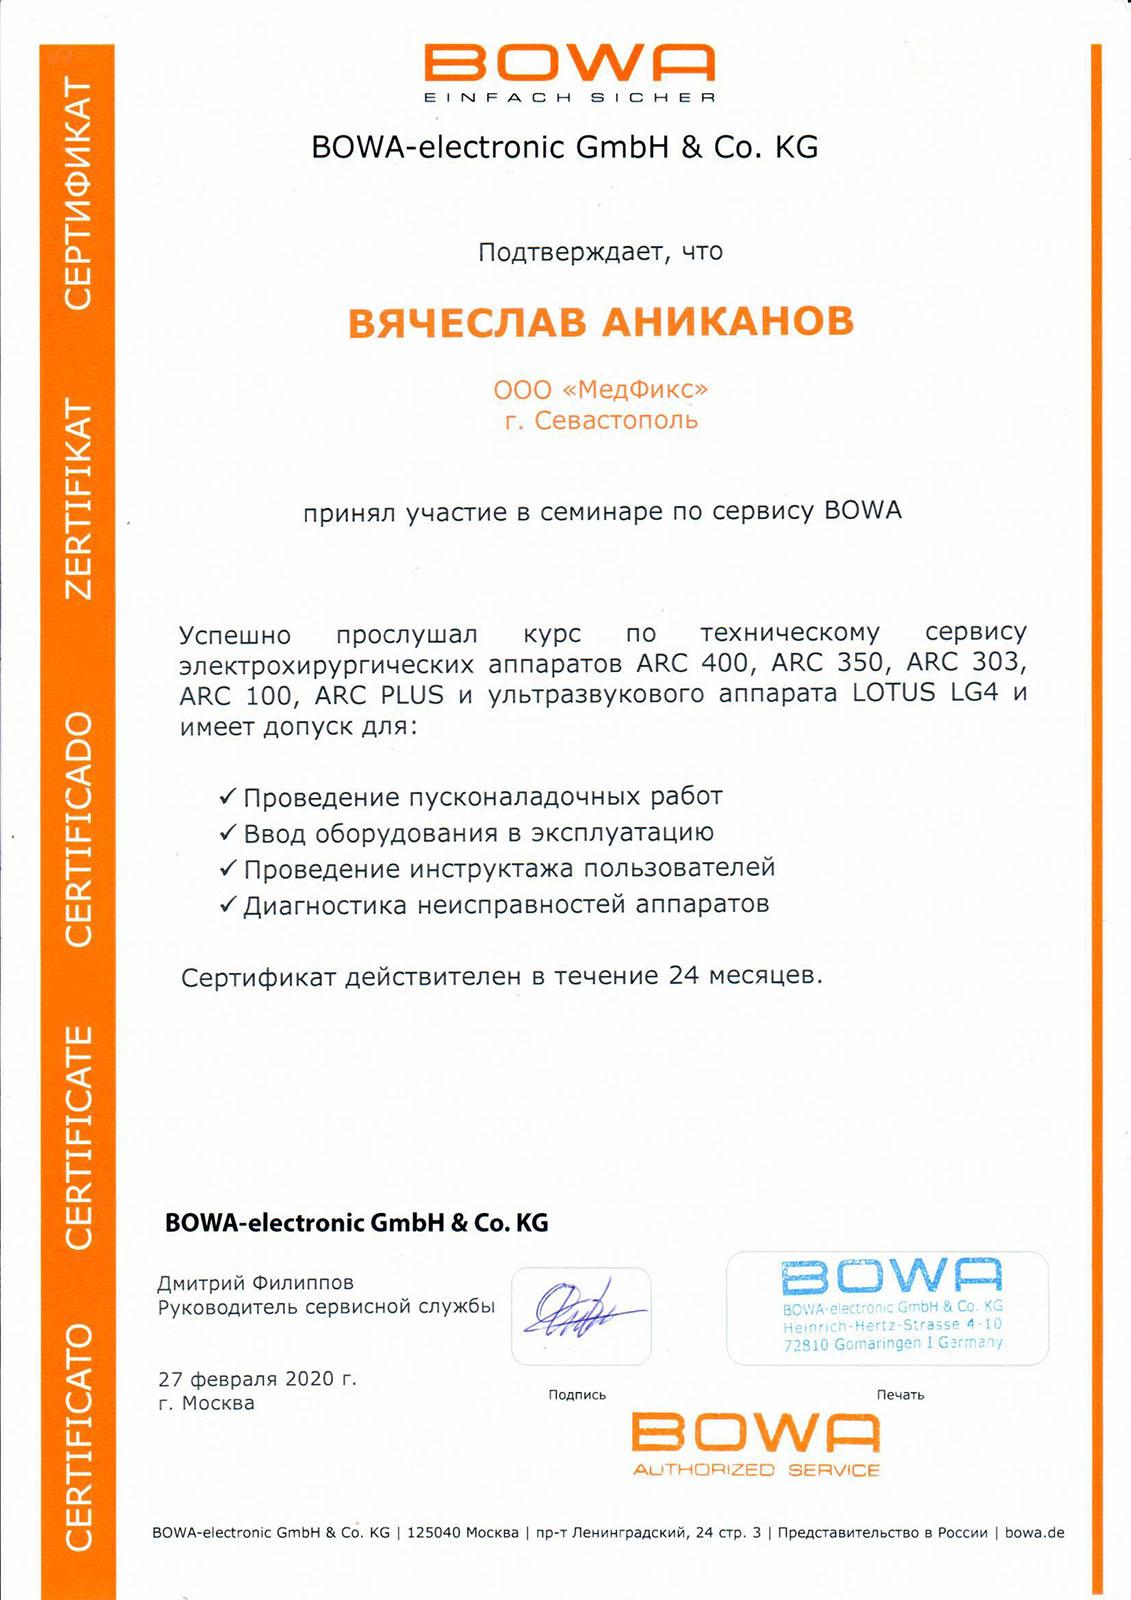 elektrohirurgicheskie-apparaty - BOWA-Anikanov-27.02.2020